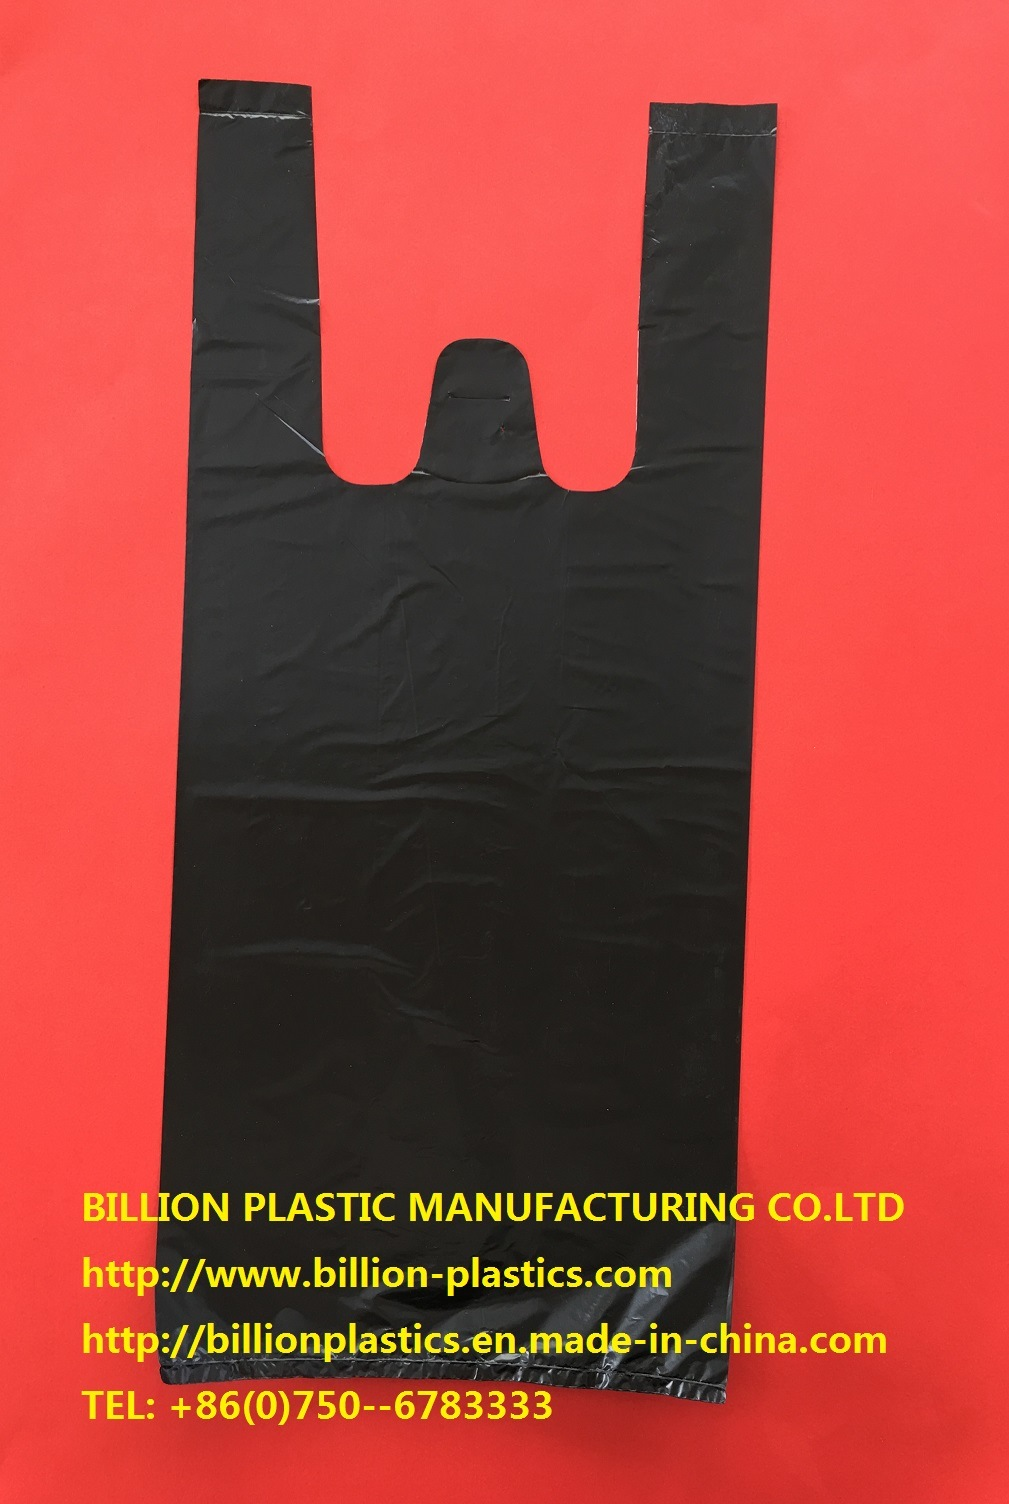 Garbage Bag Rubbish Bag Trash Can Liner Garbage Bag Rubbish Bag T-Shirt Bag Carrier Bag Shopping Bag Polybag Gusset Bag